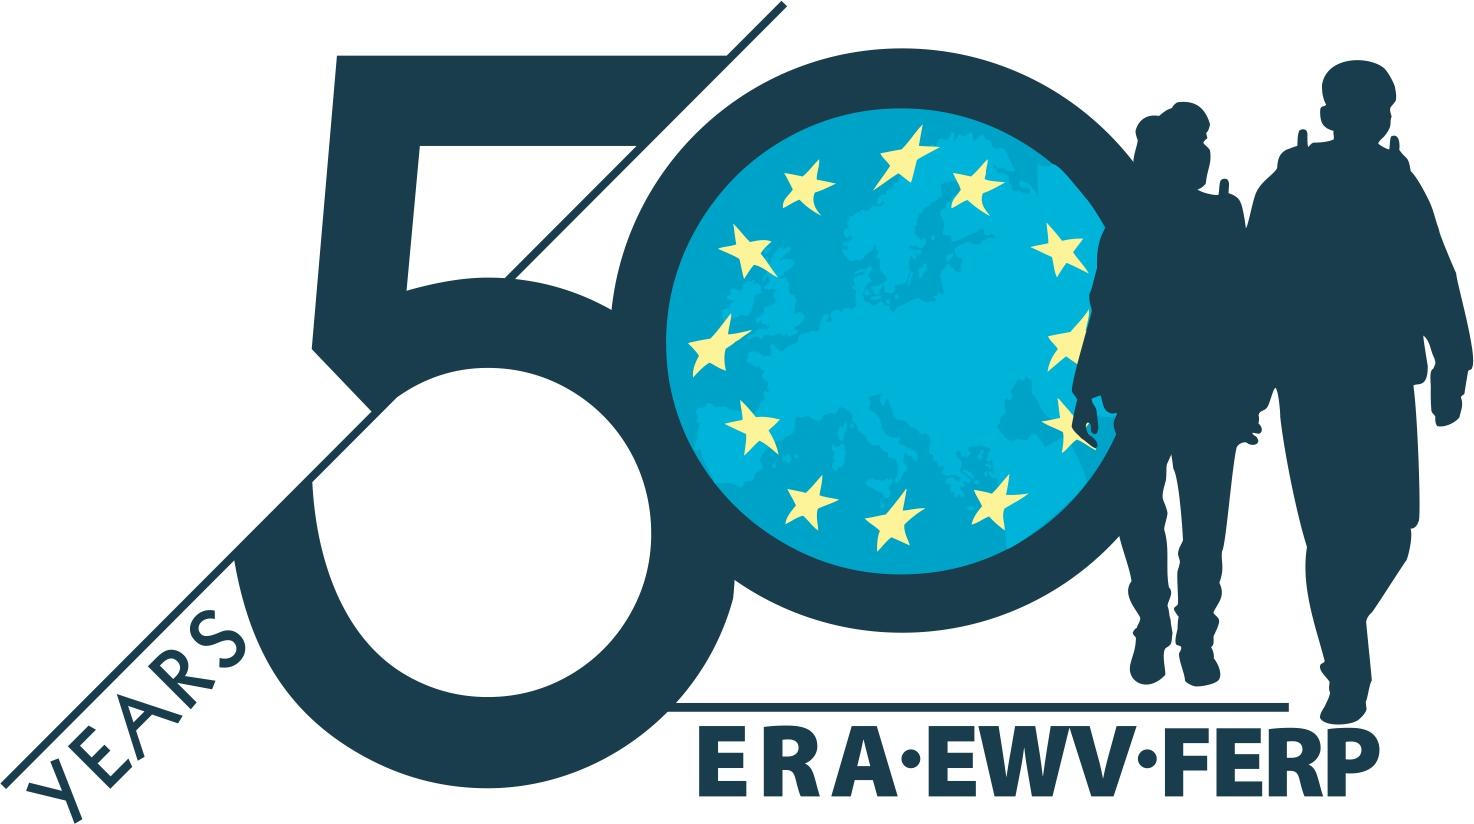 logo for European Ramblers' Association